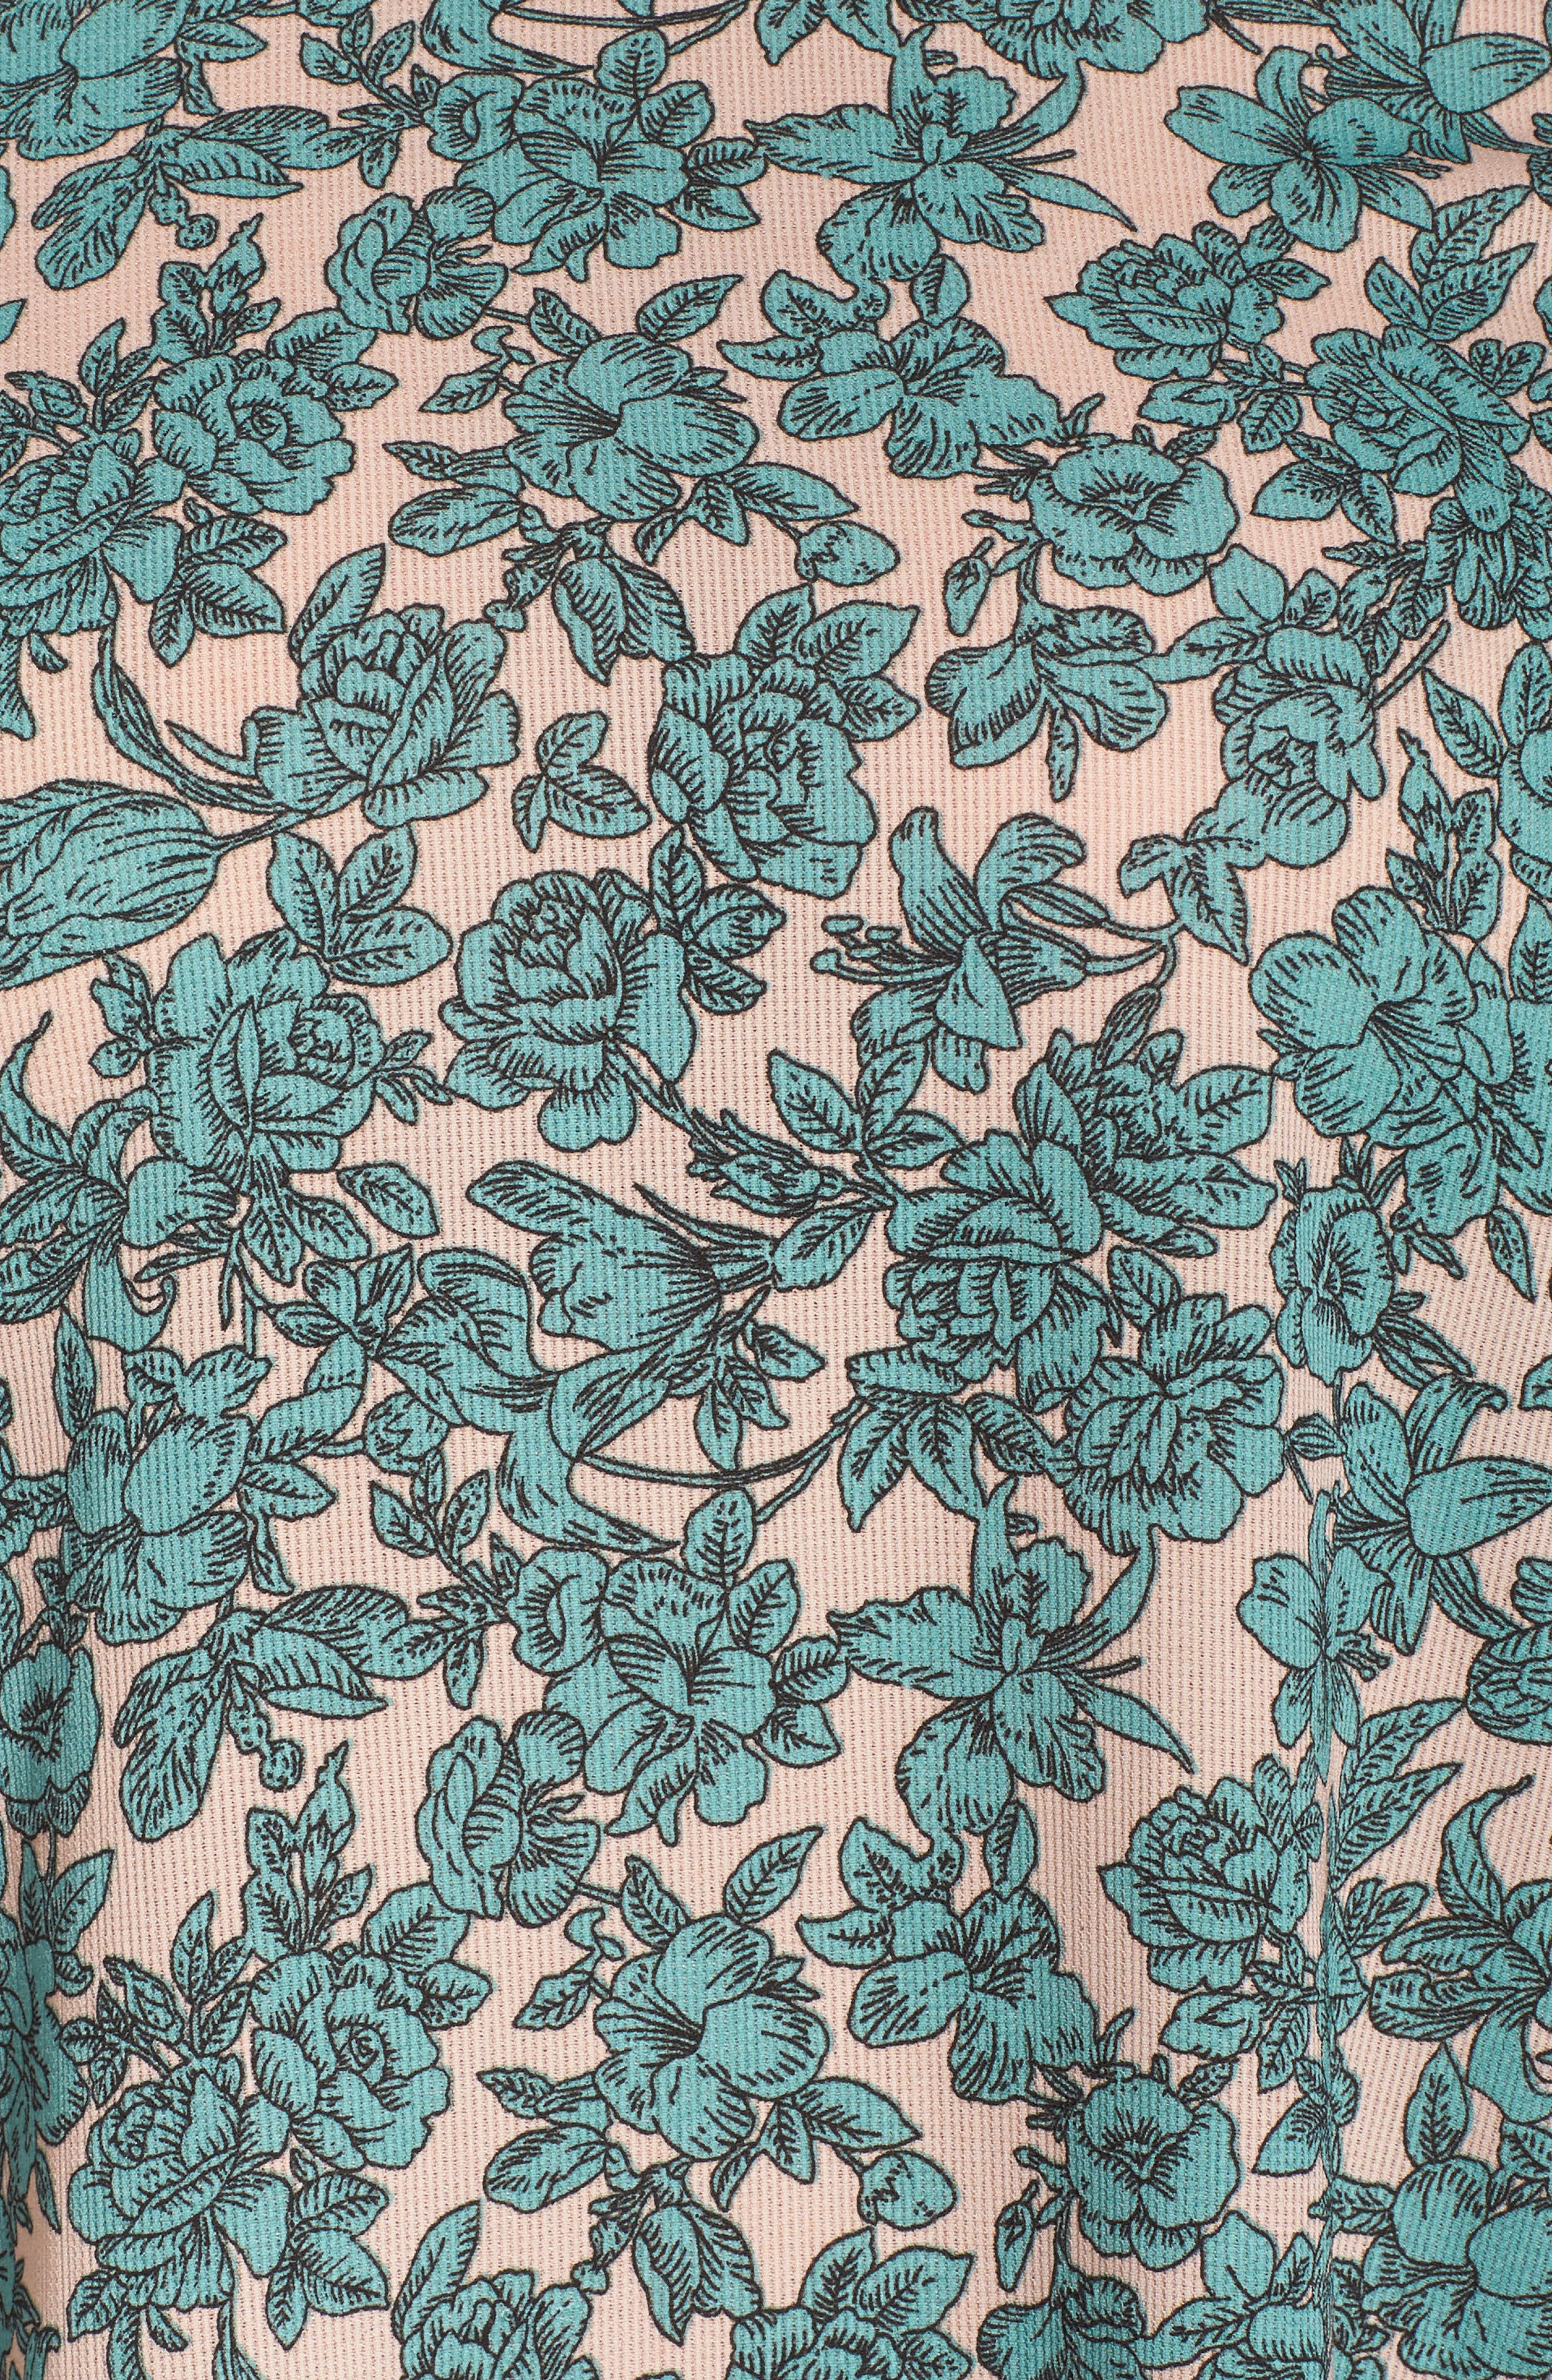 Floral Shift Dress,                             Alternate thumbnail 5, color,                             300